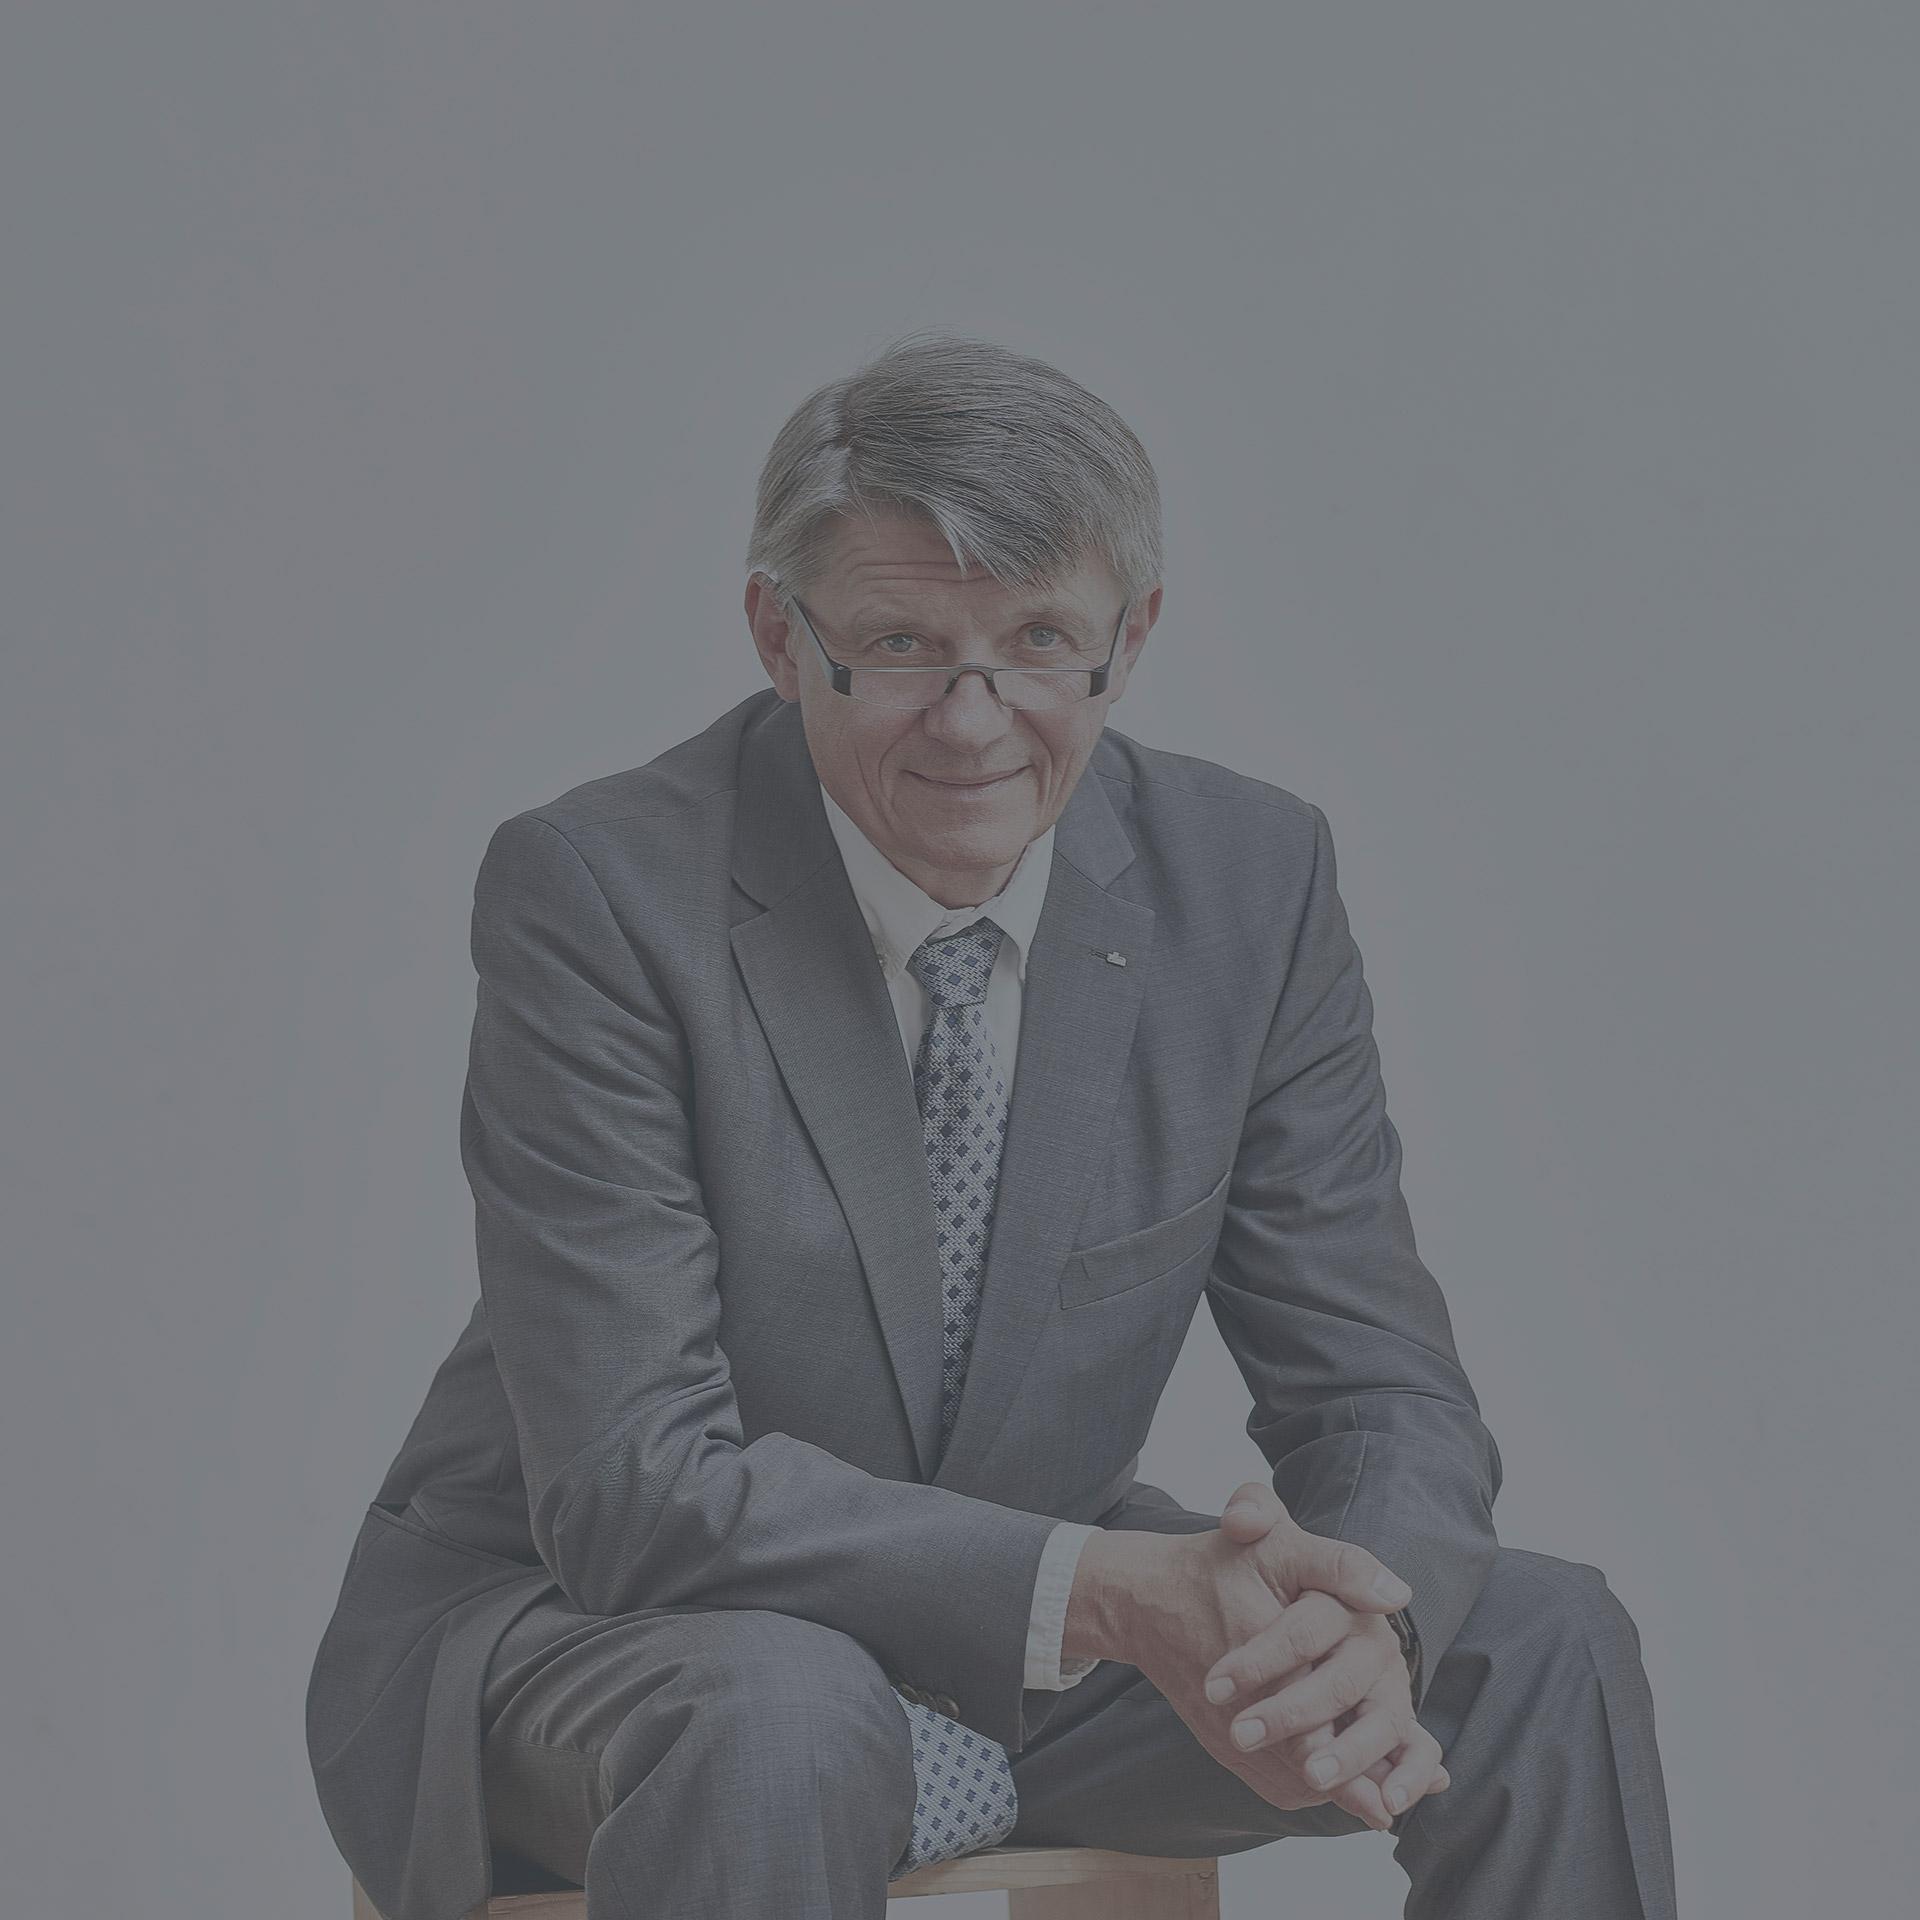 Martin Rivoir –Landtagsabgeordneter SPD, Wahlkreis Ulm/Alb-Donau –Newsletter